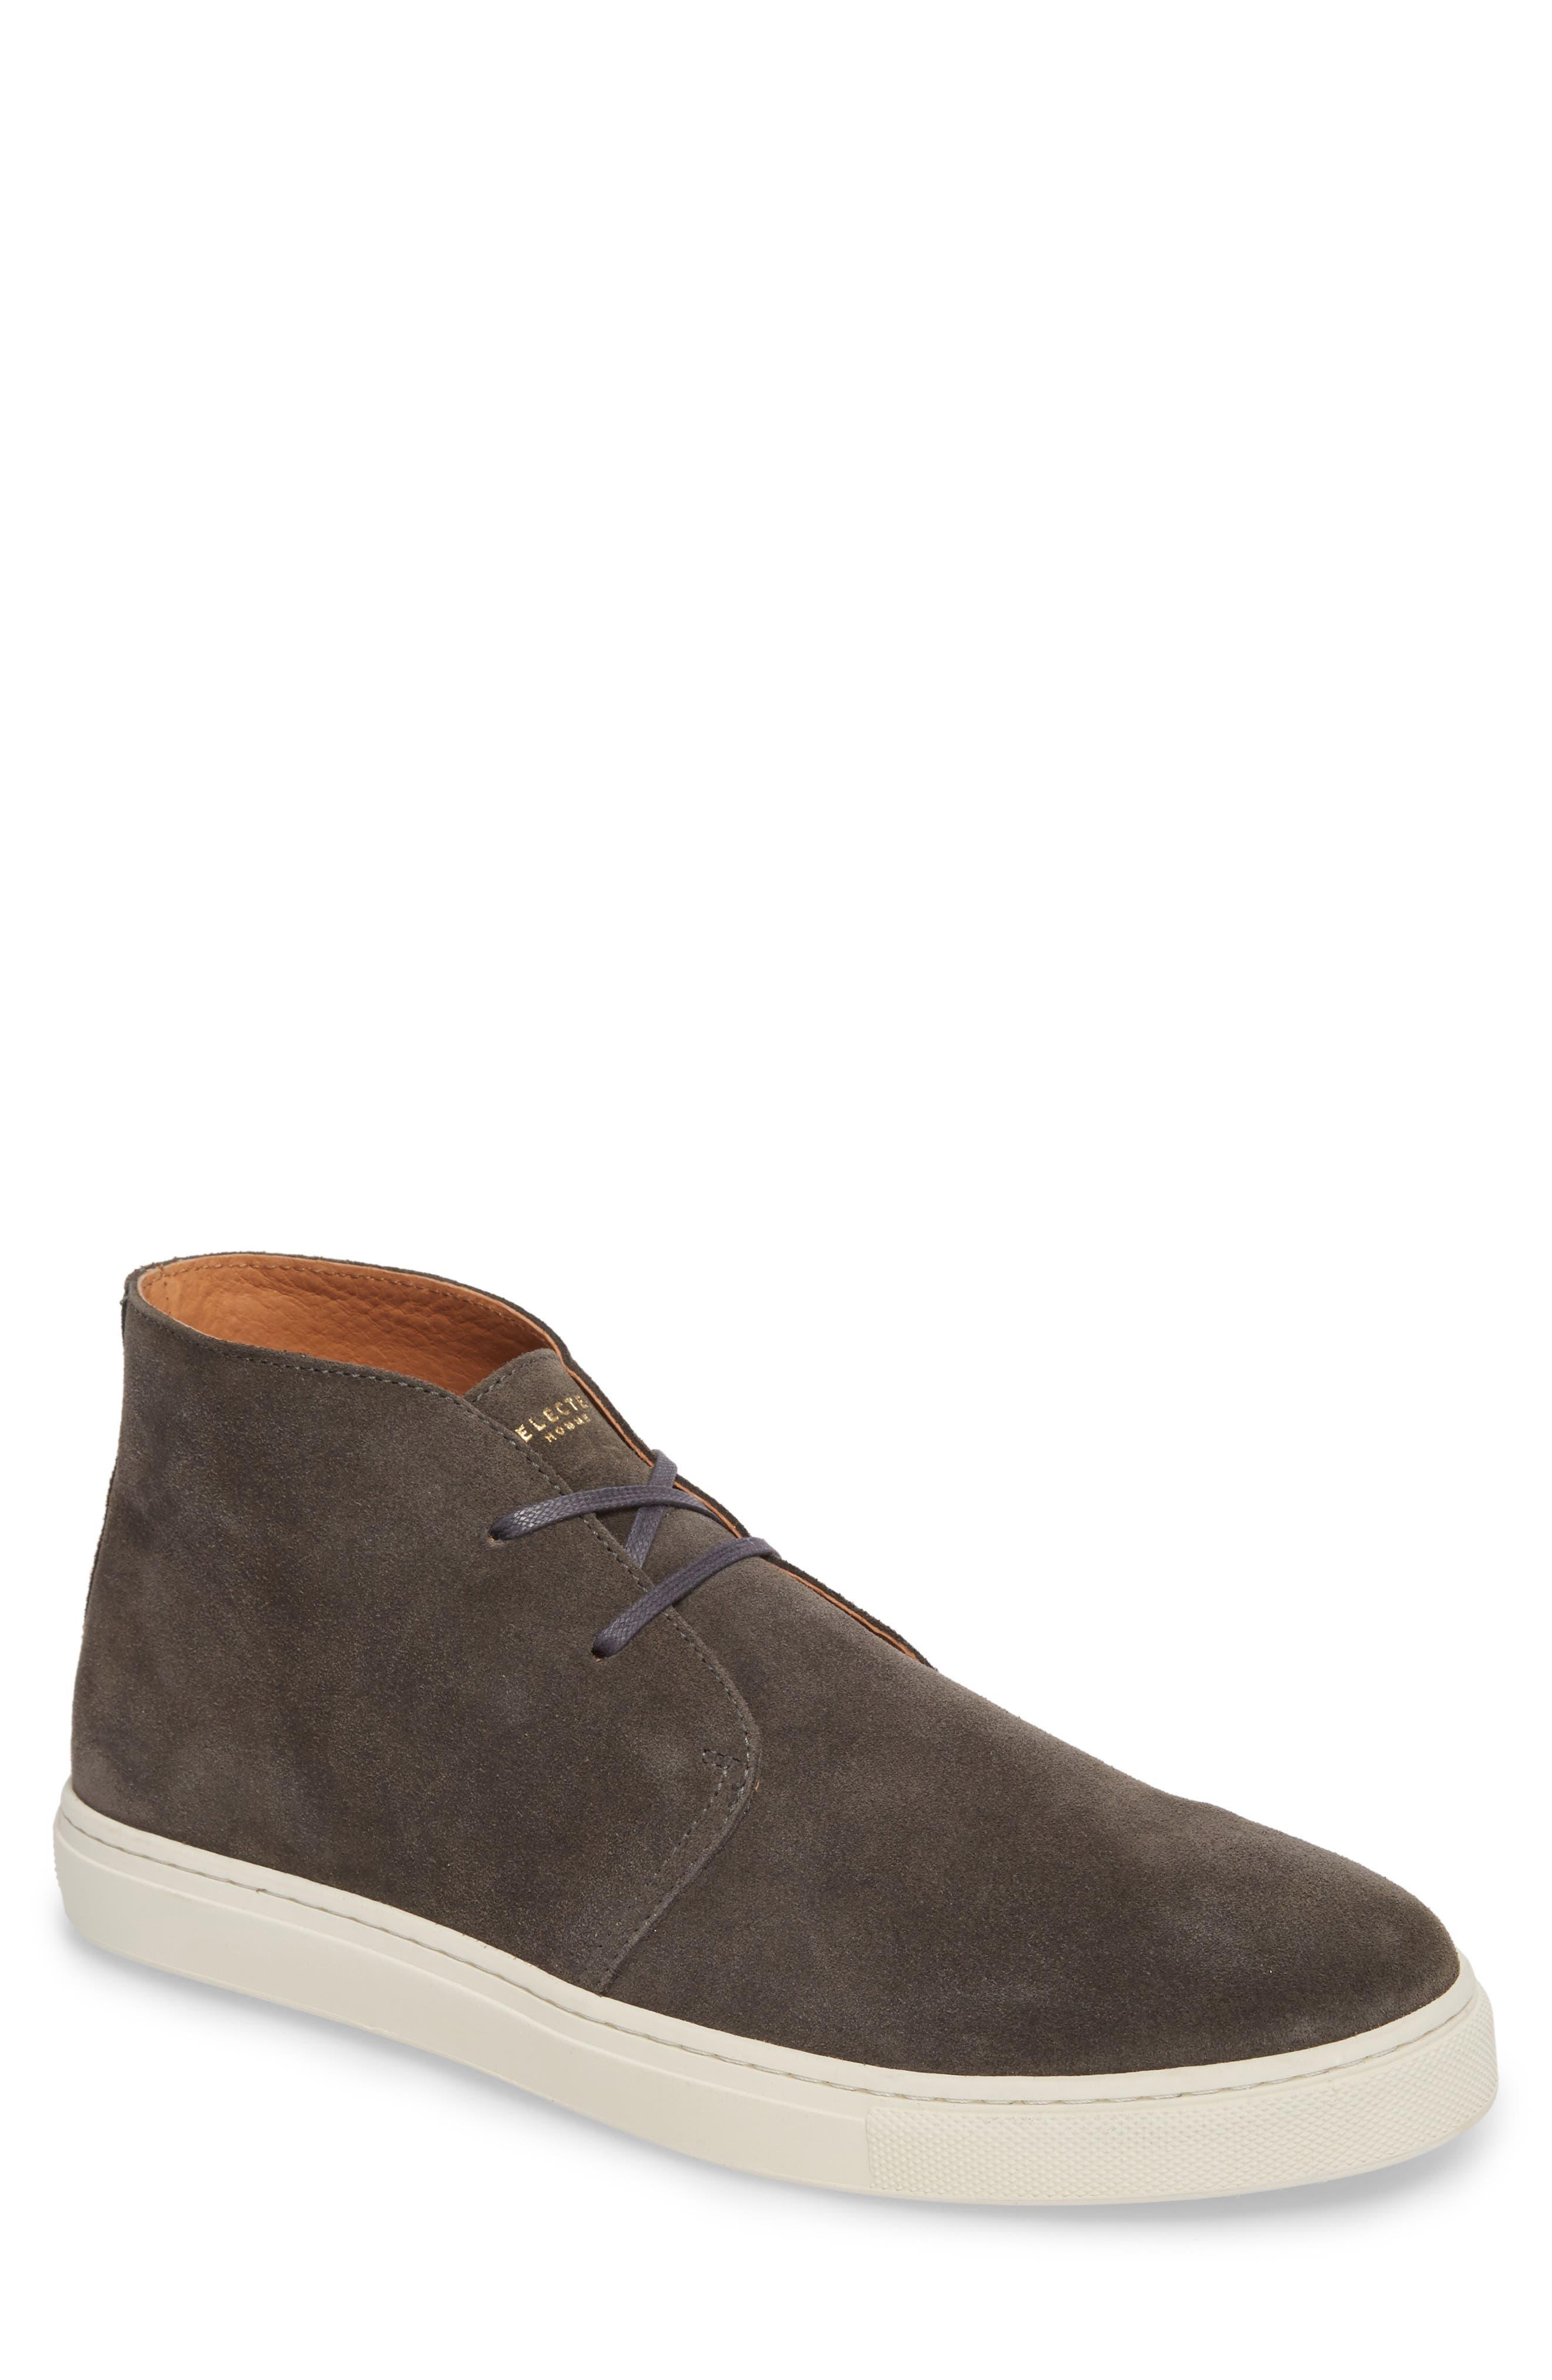 Dempsey Chukka Sneaker,                             Main thumbnail 1, color,                             Grey Suede